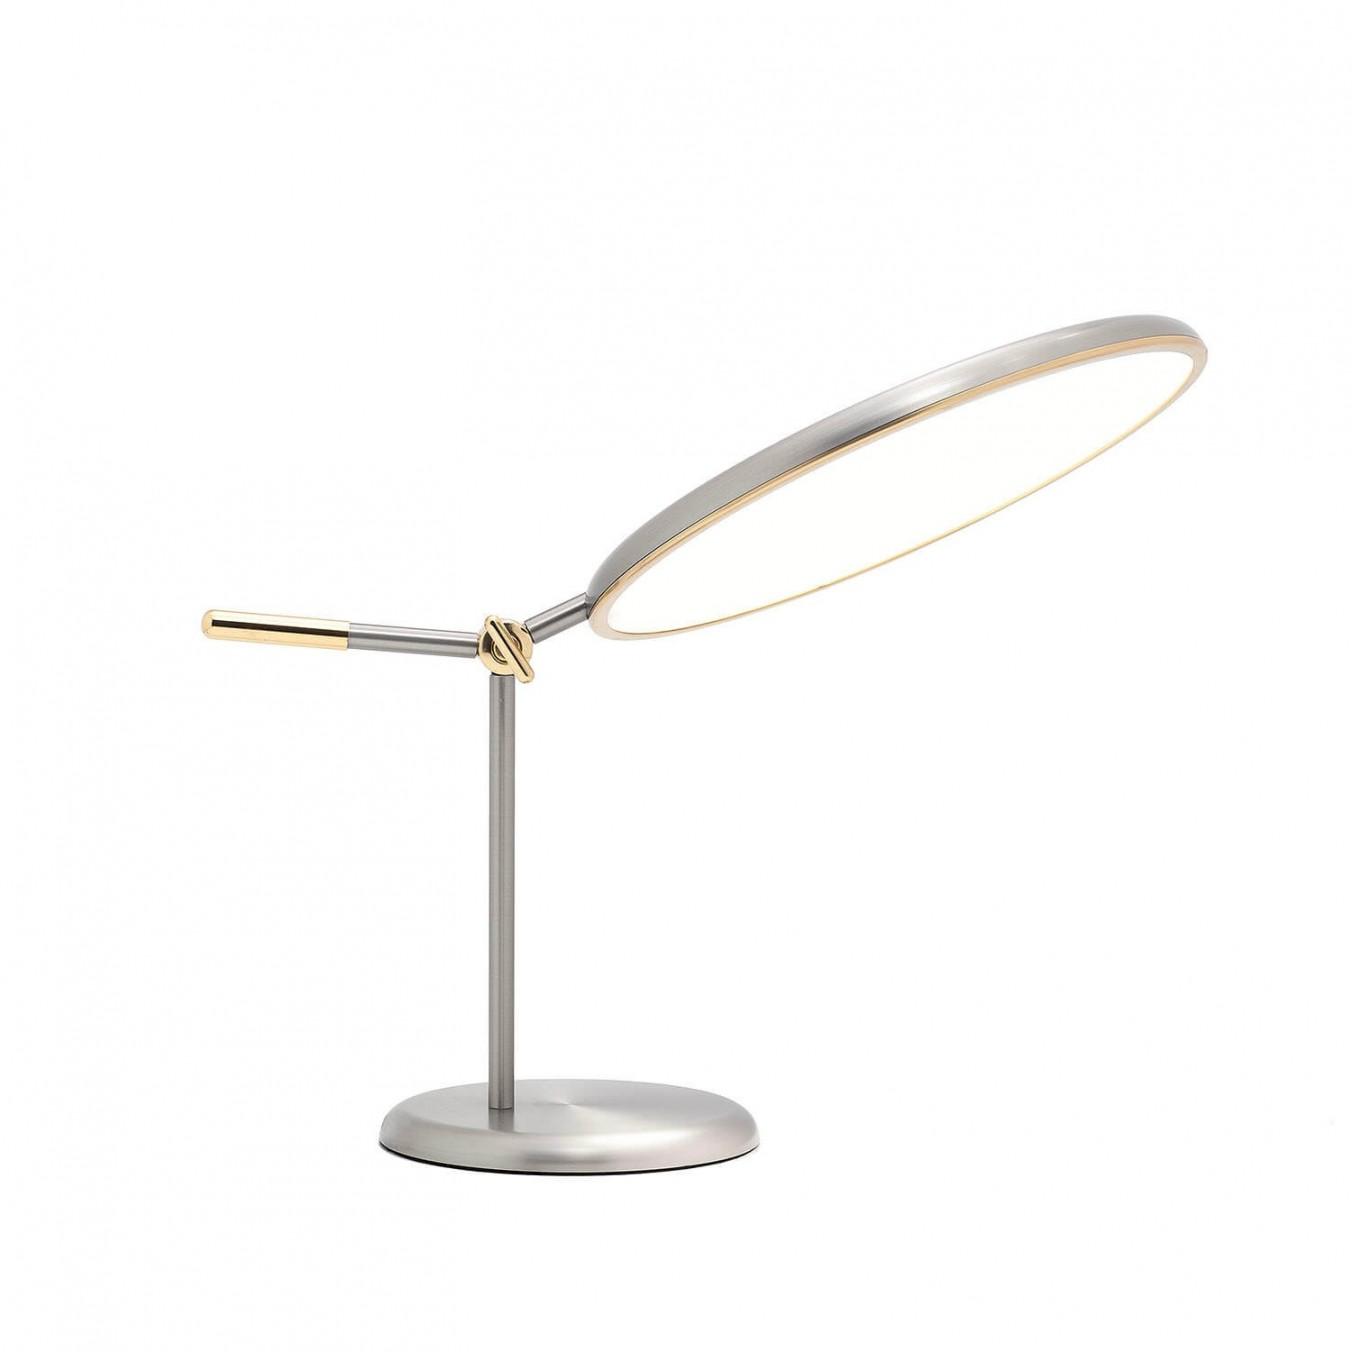 Full Moon Table Lamp